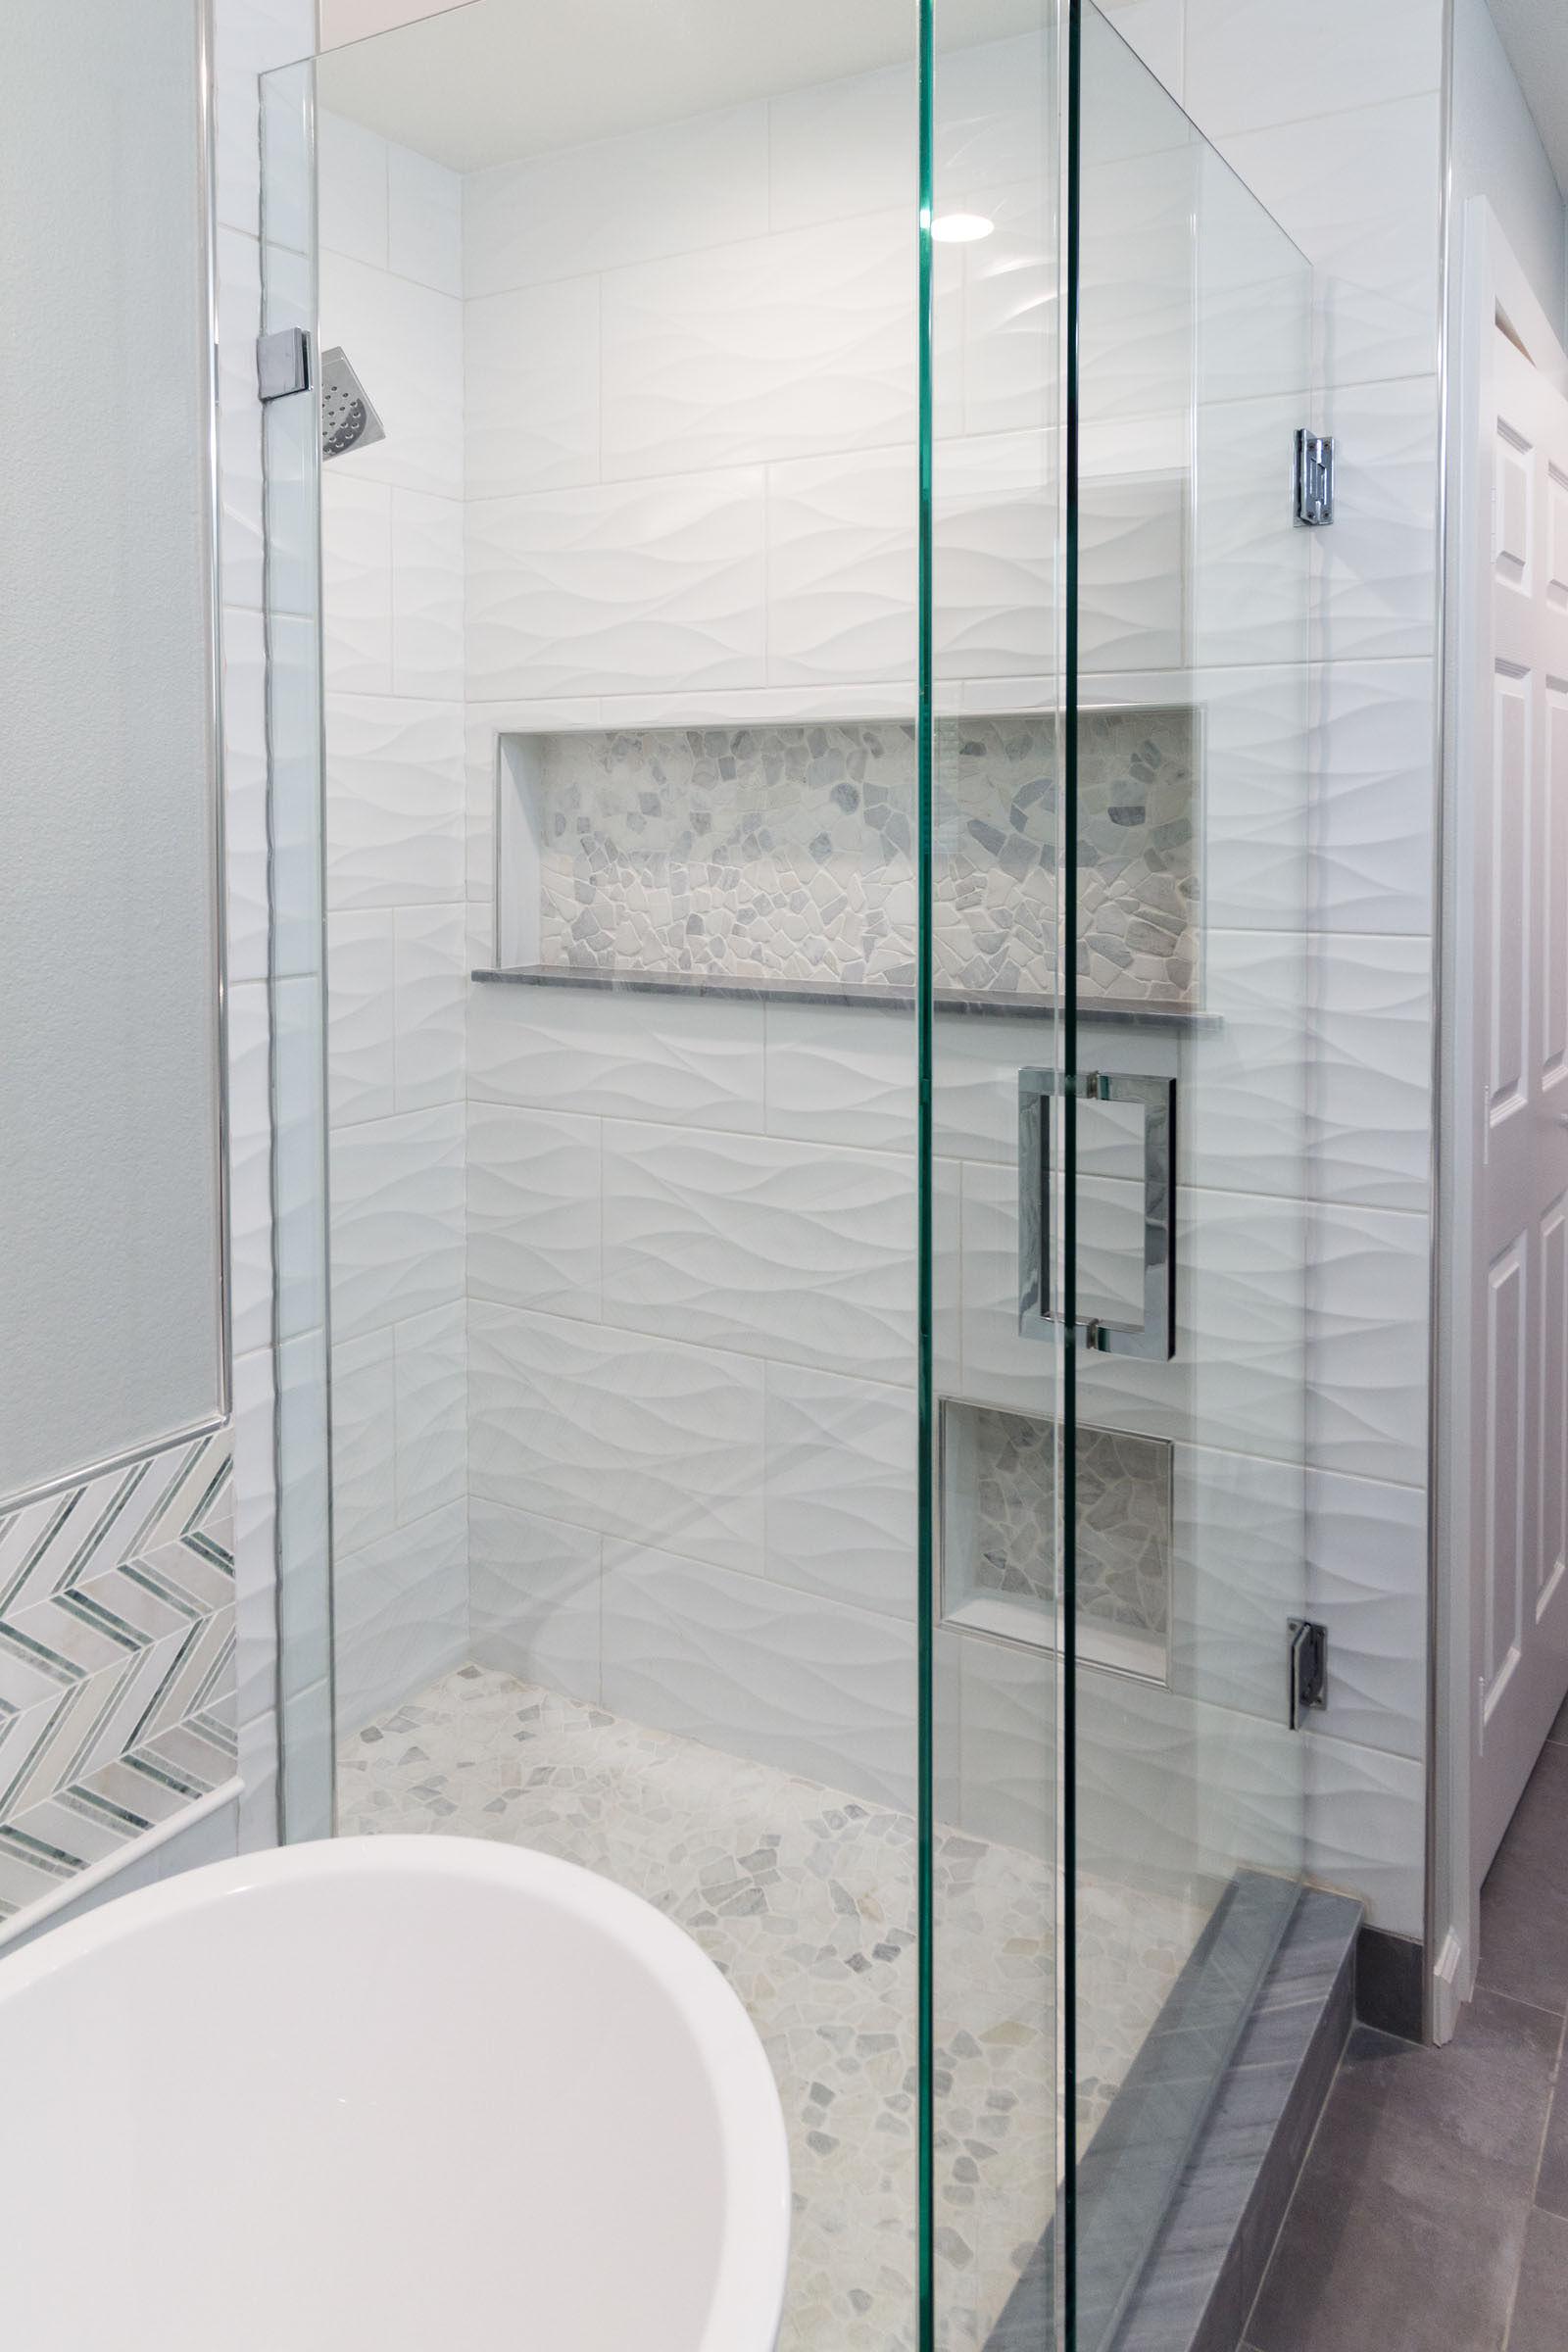 White and grey bathroom remodel, classic tile variations, pedestal tub, walkin shower